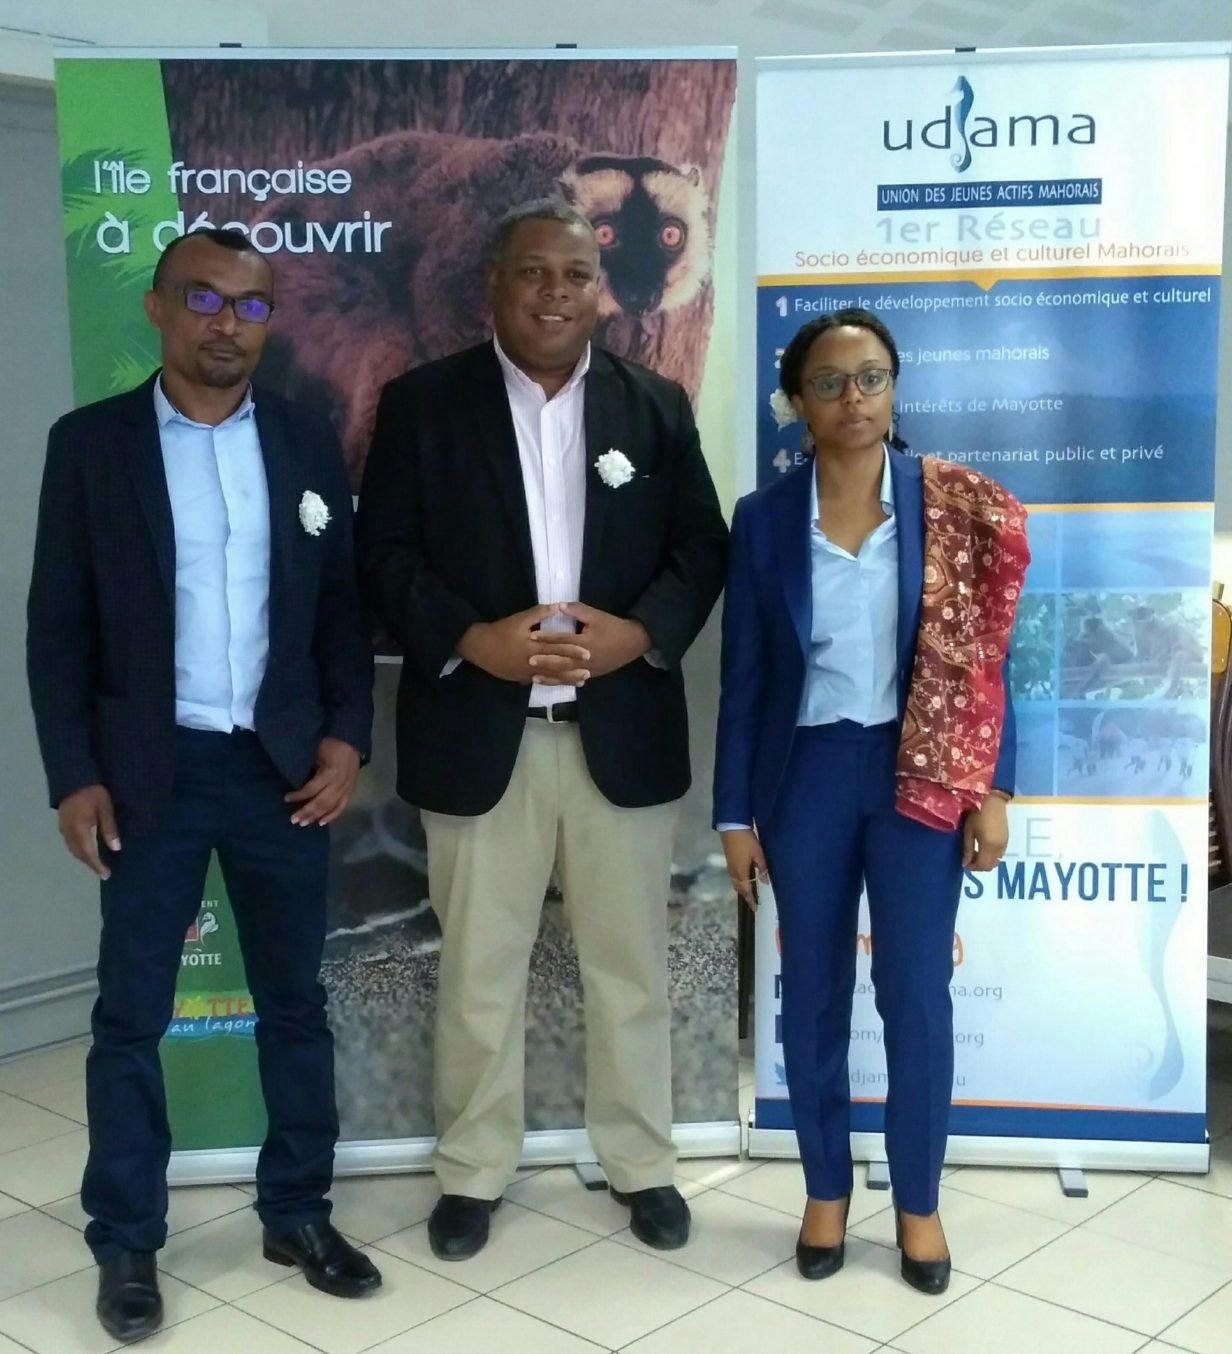 Mayotte et vous 2nde Ahamada M Daniel Z Cansel B